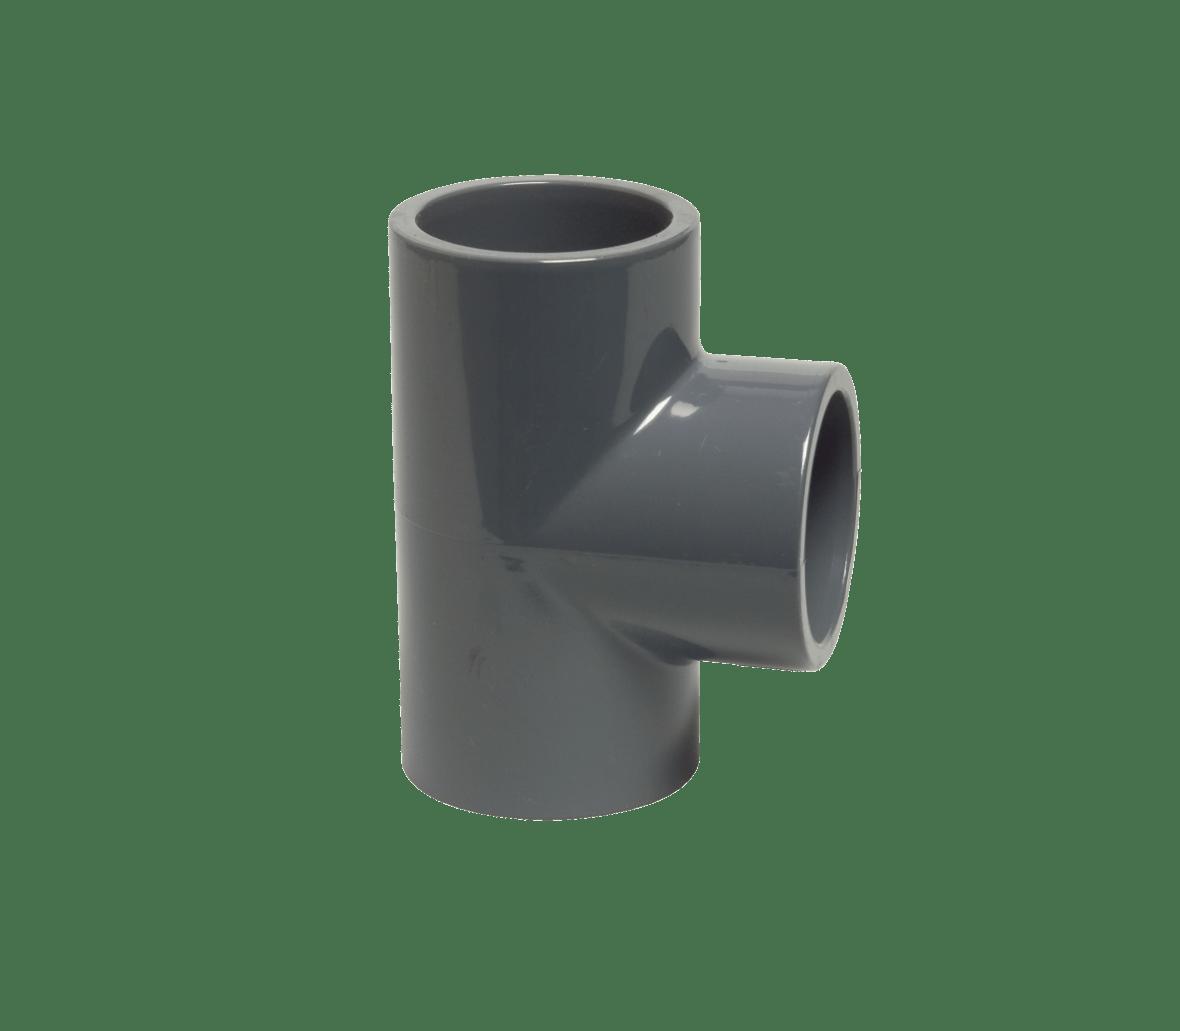 50 mm diameter PVC T-piece